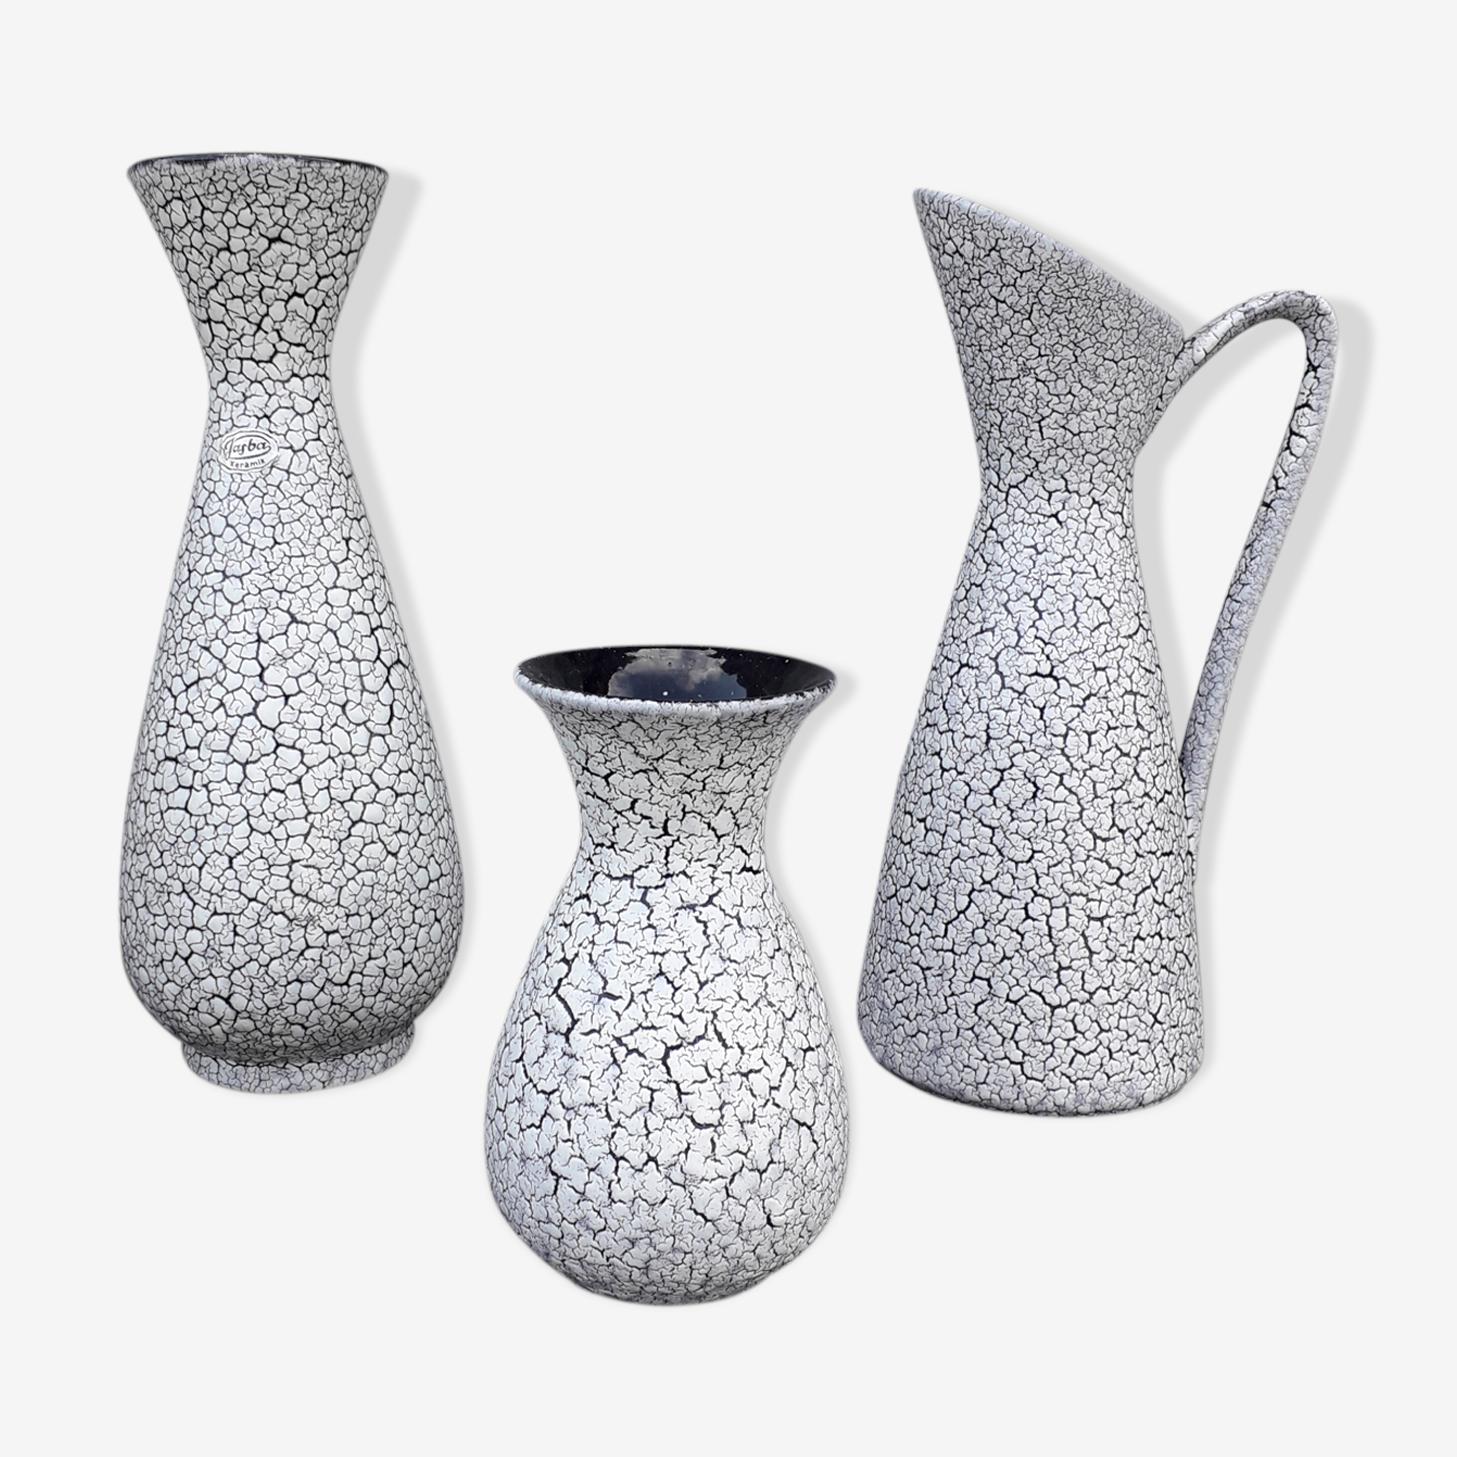 Lot of 3 vases Jasba Keramik Germany decor Cortina